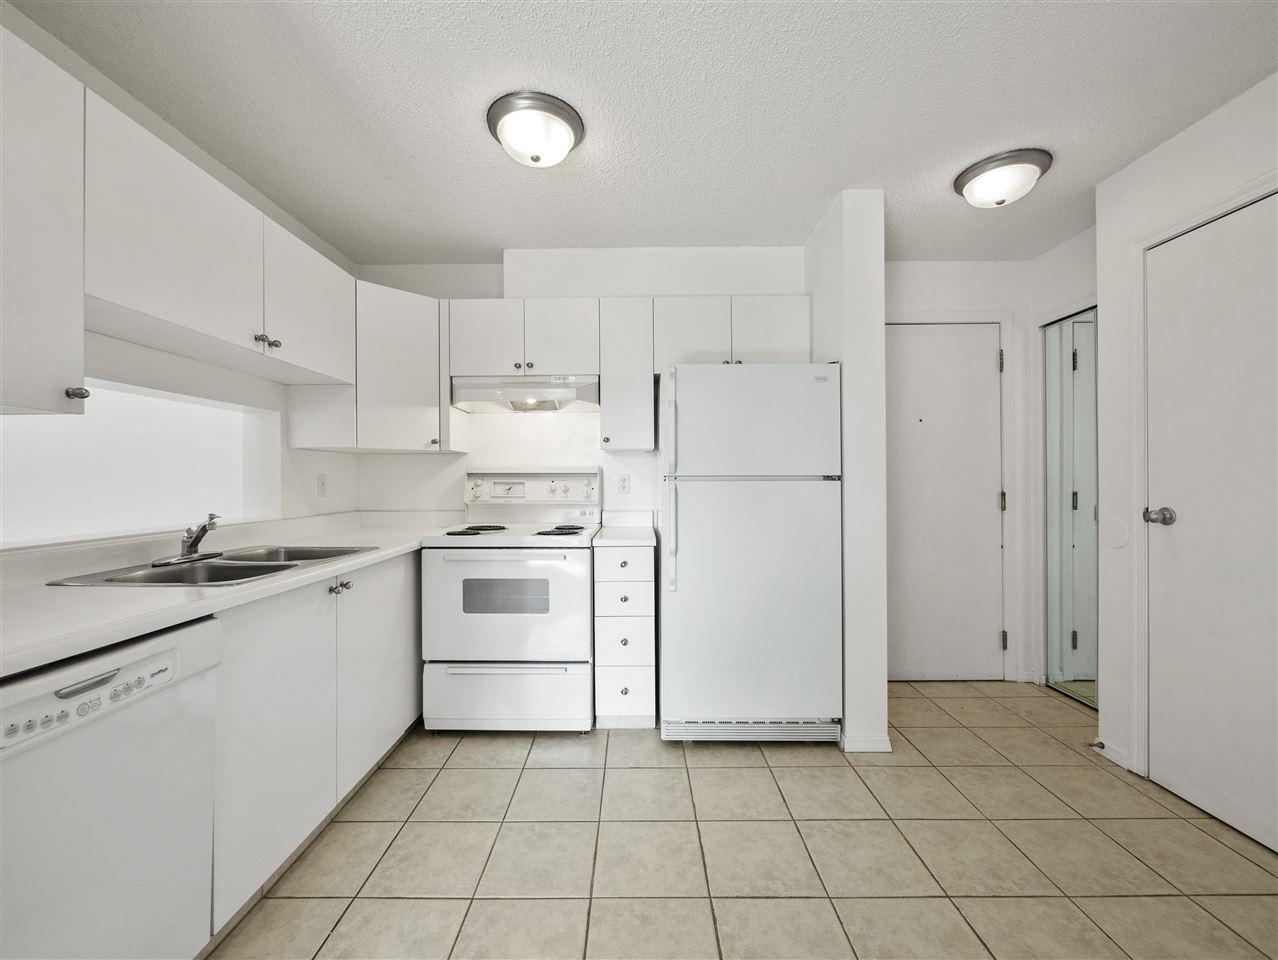 201 9619 174 Street, 2 bed, 2 bath, at $145,000